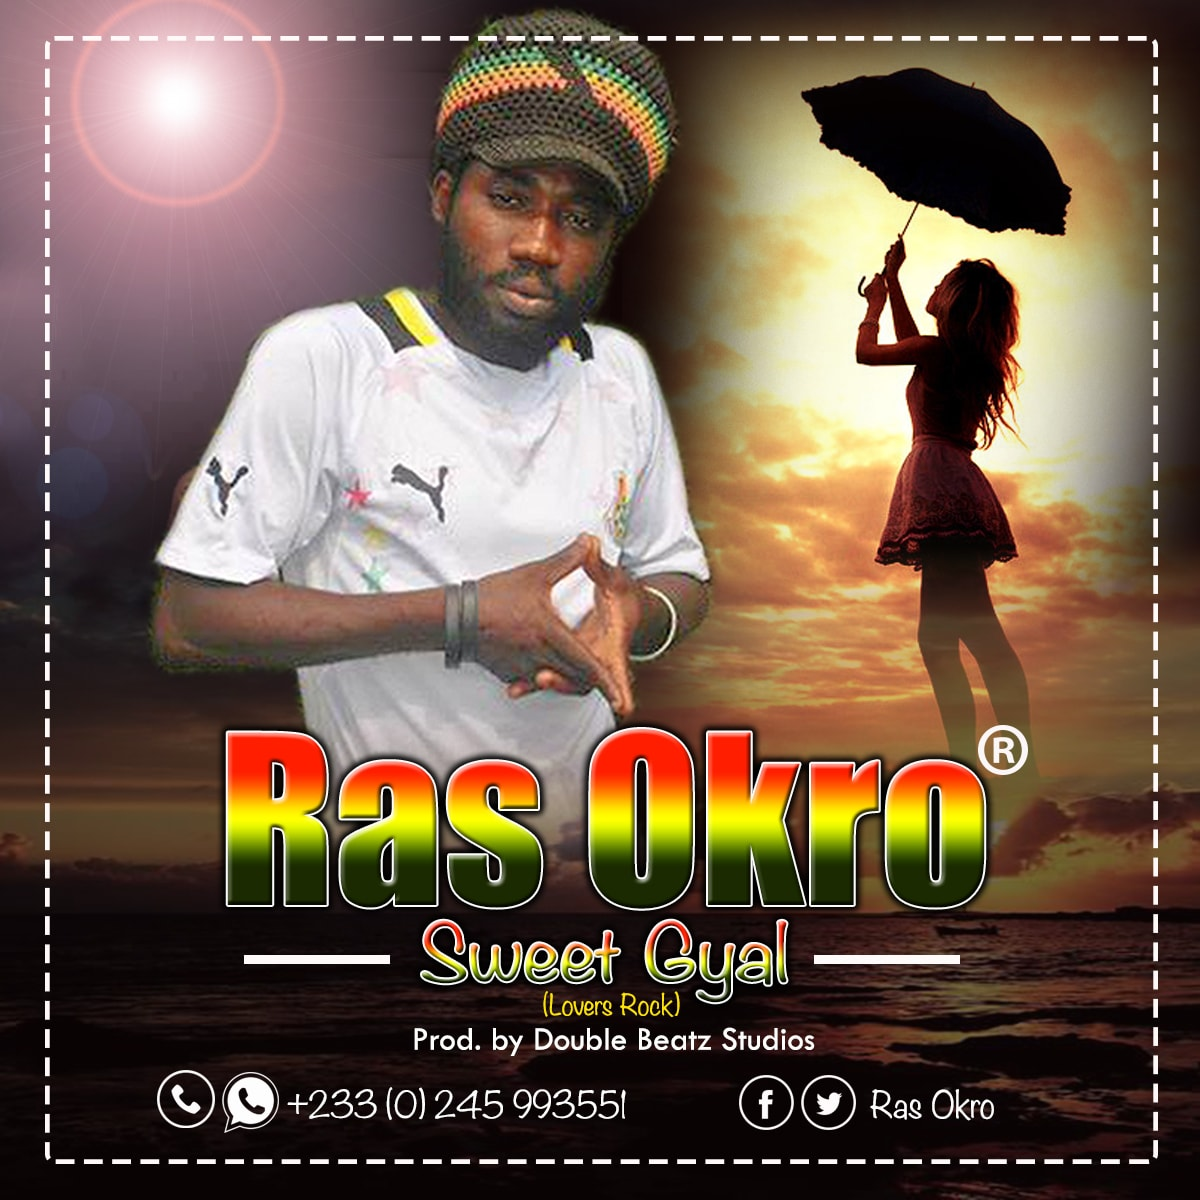 RAS OKRO Sweet Gyal min